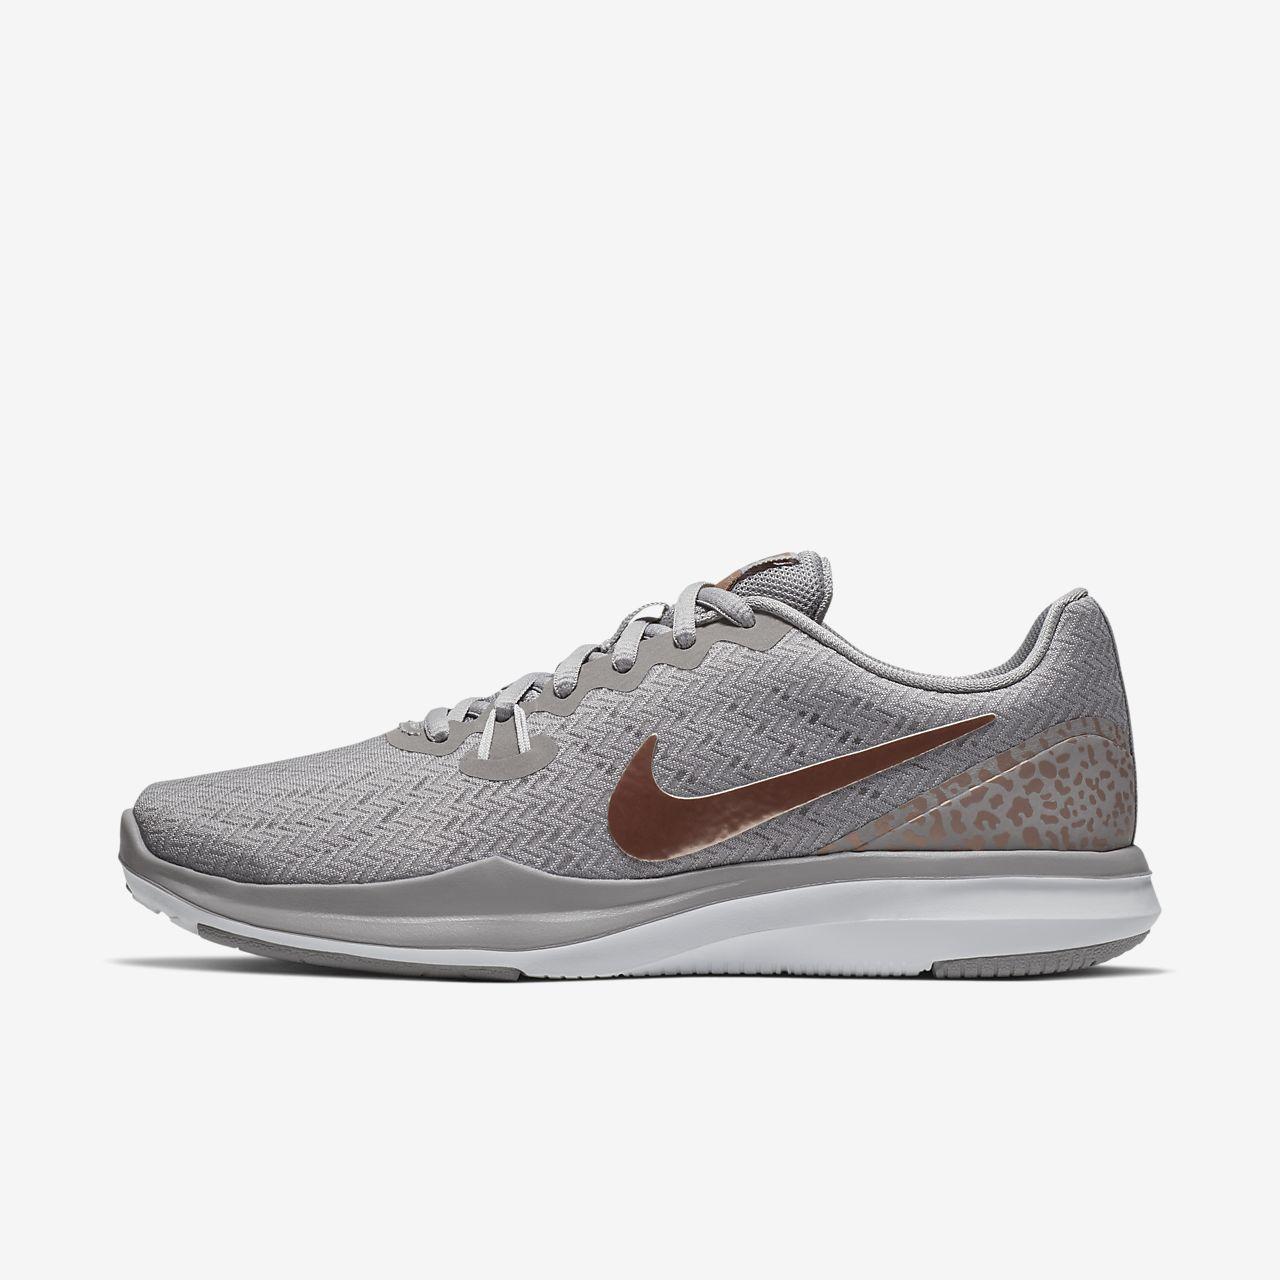 cheap sale classic Women's Nike In-Season TR 7 Training Shoes footlocker finishline sale online clearance for nice K40yyFkQux